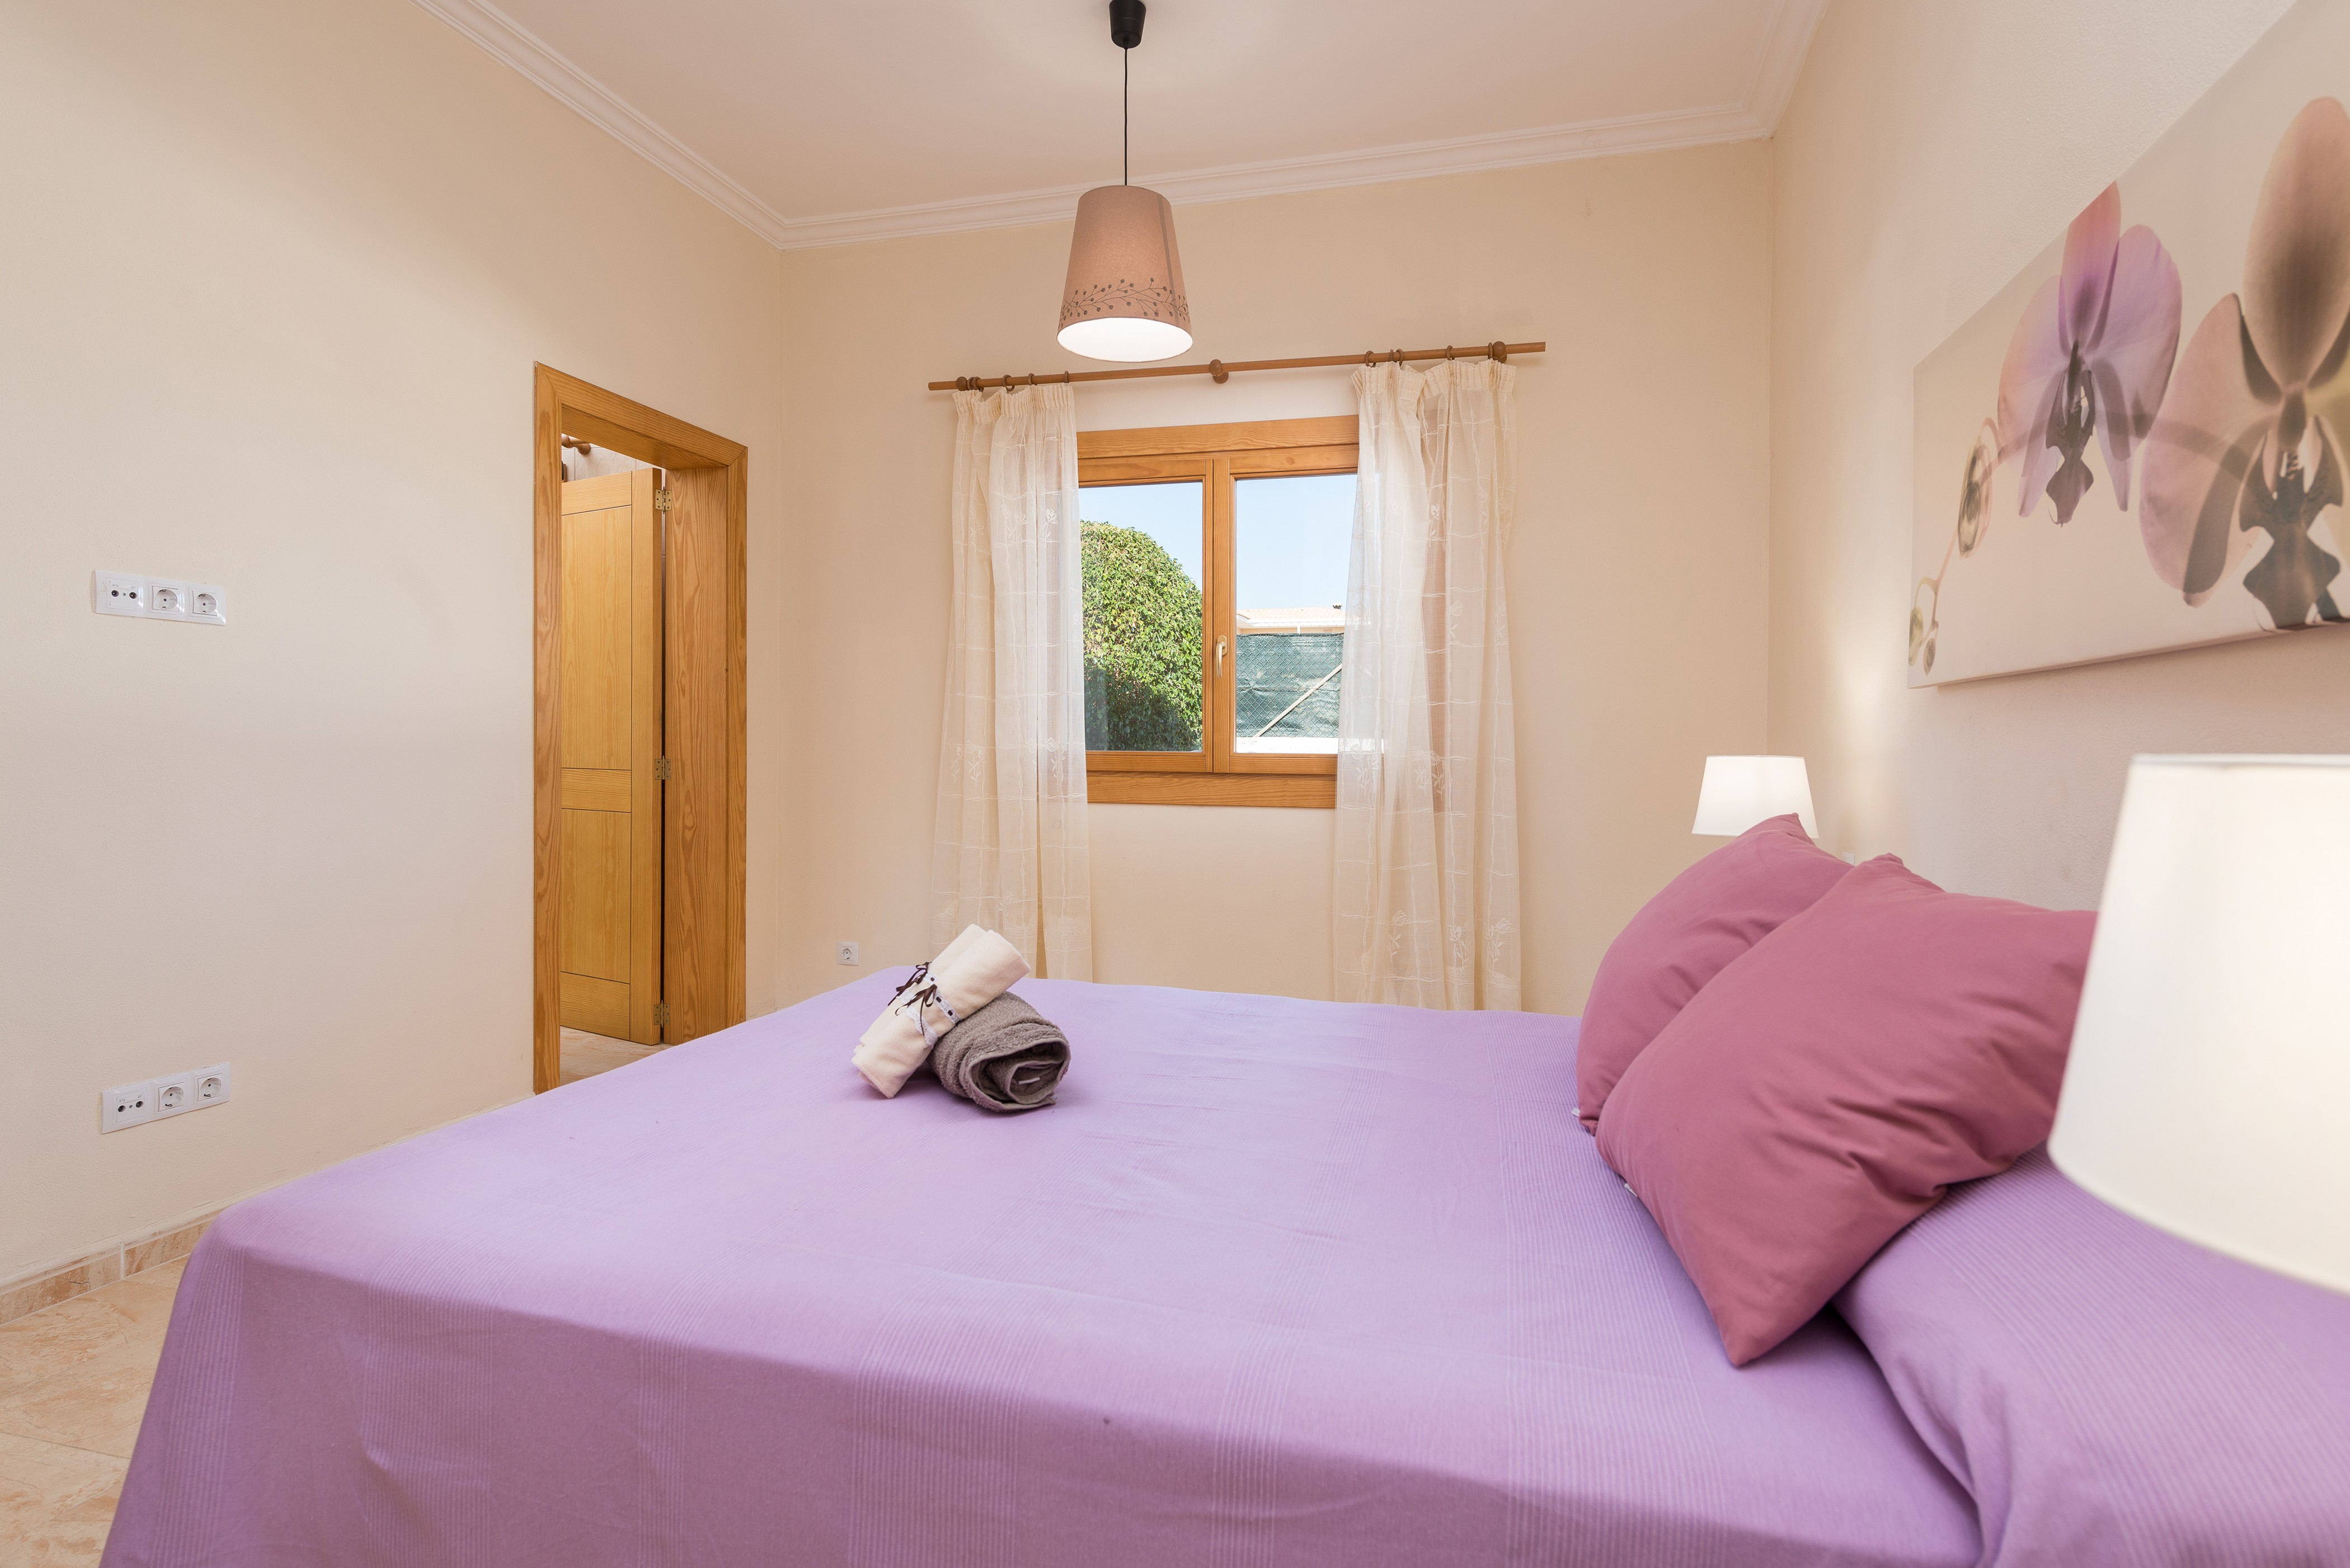 Ferienhaus CAN MOLINA (2063640), Cala Mandia, Mallorca, Balearische Inseln, Spanien, Bild 23